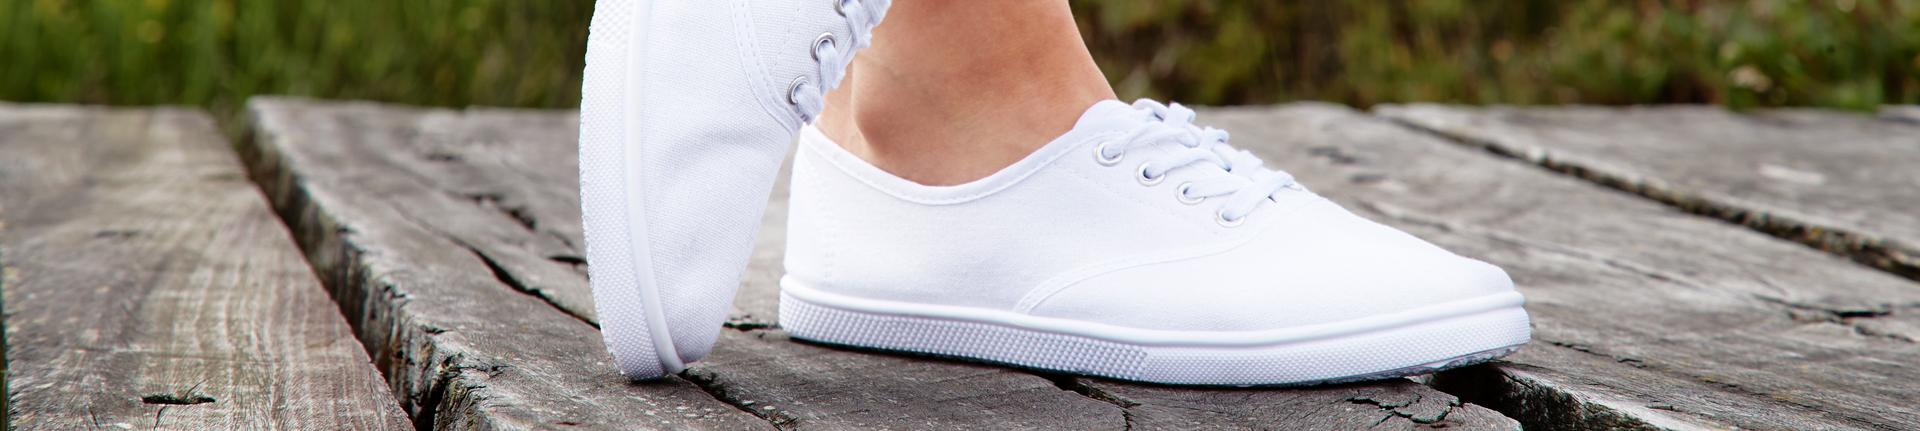 Limpando o tênis de cor branca